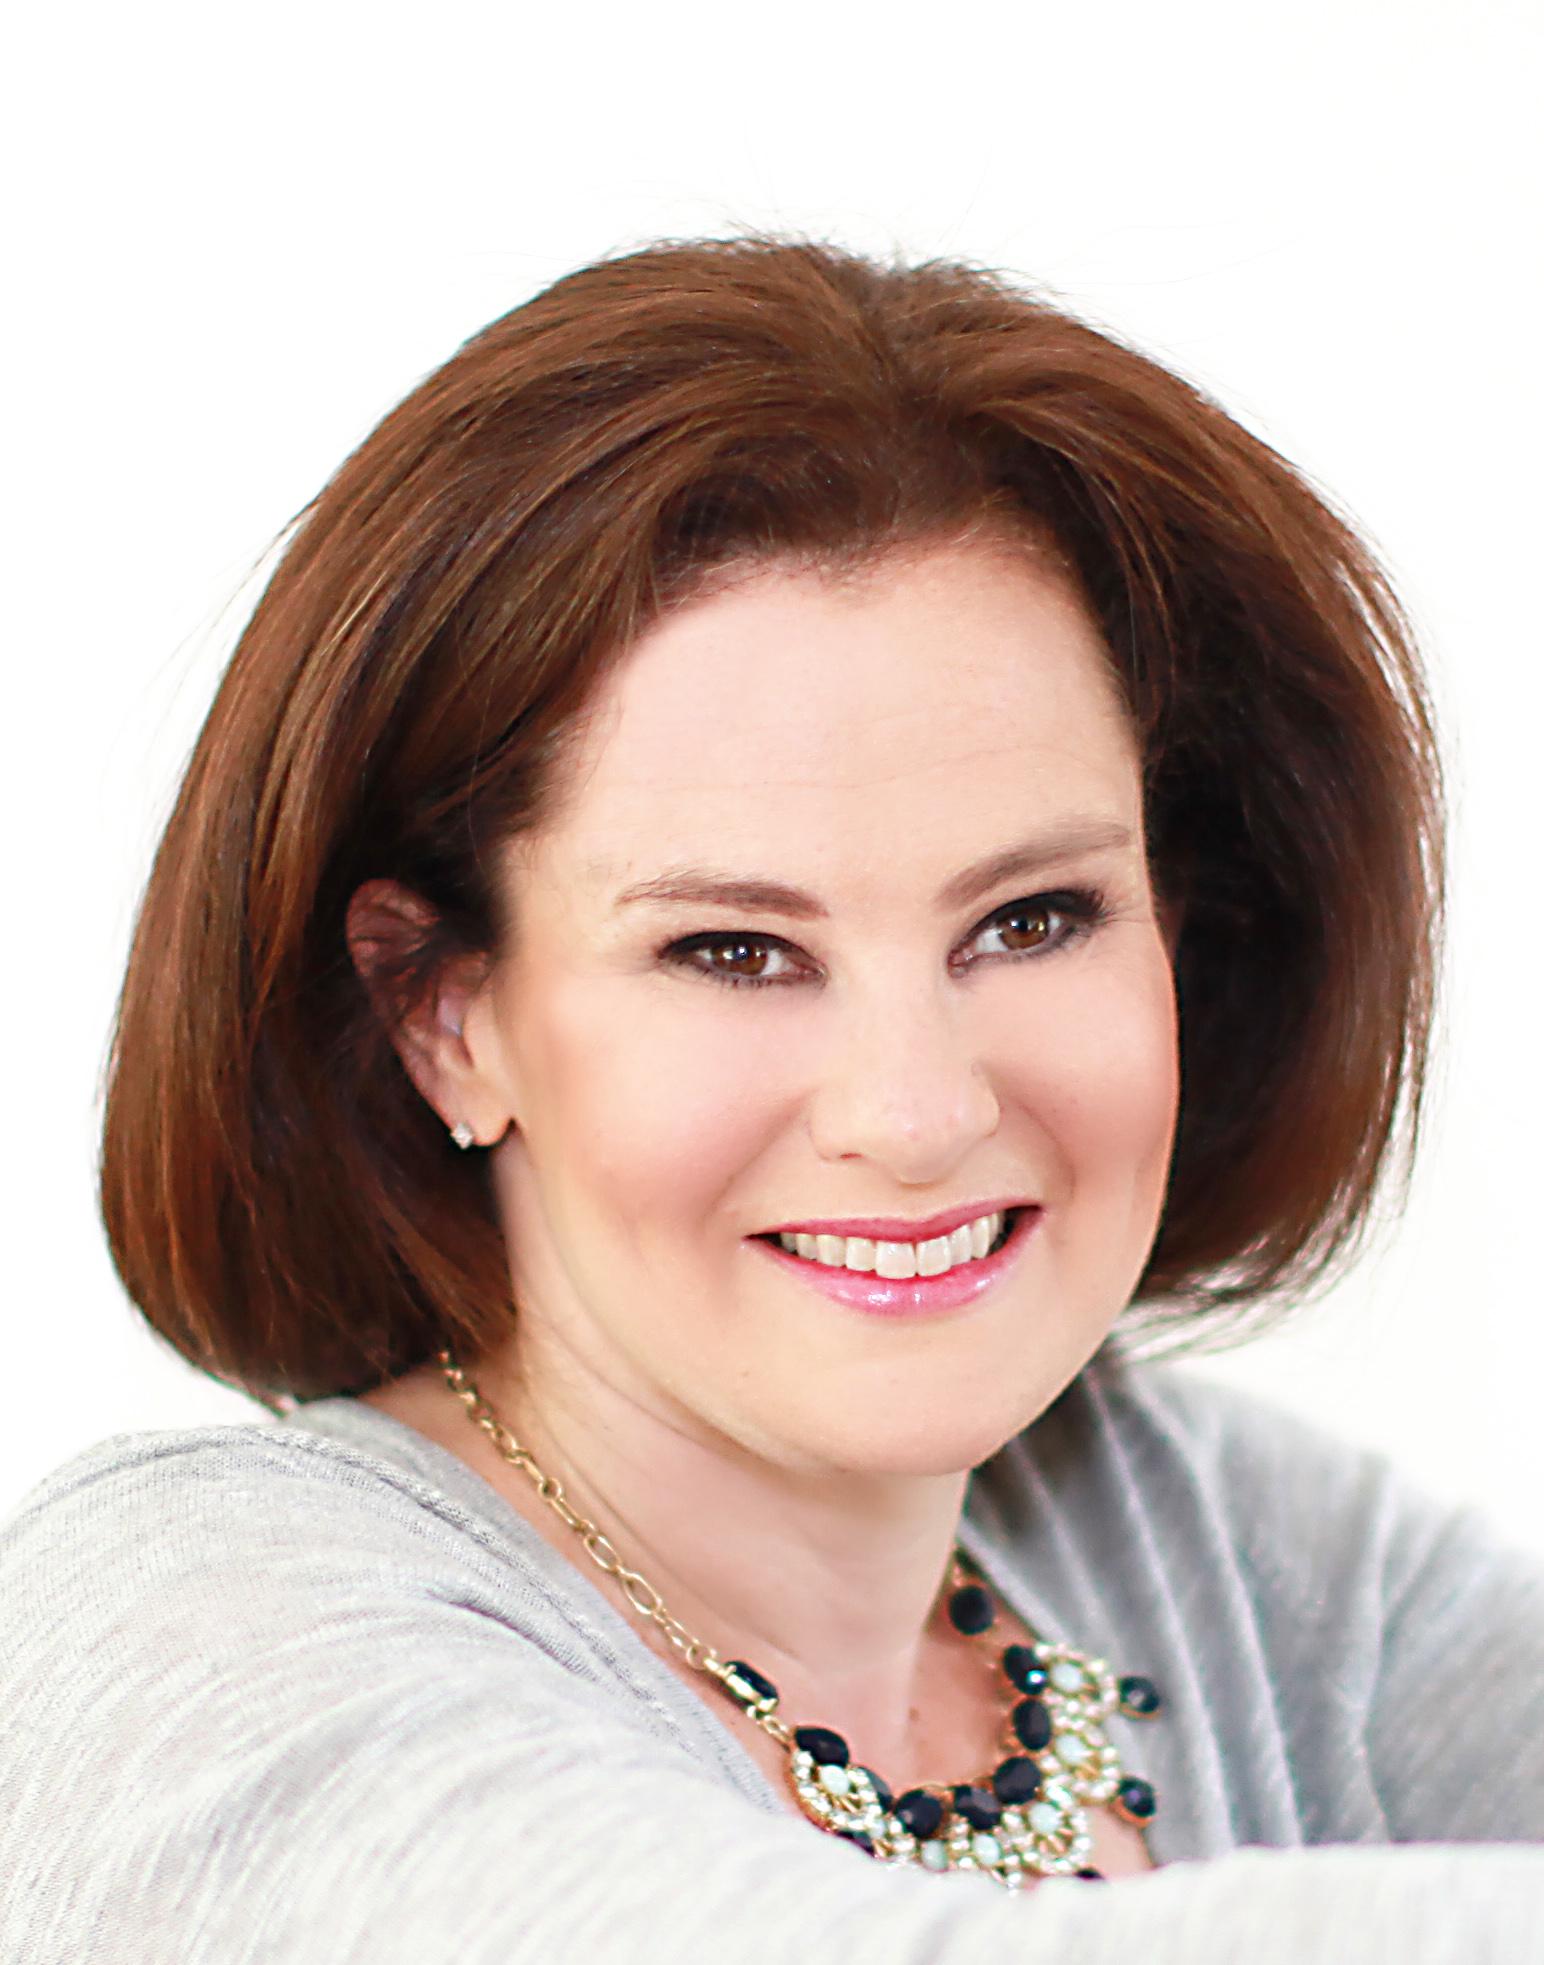 Laurie Berenson